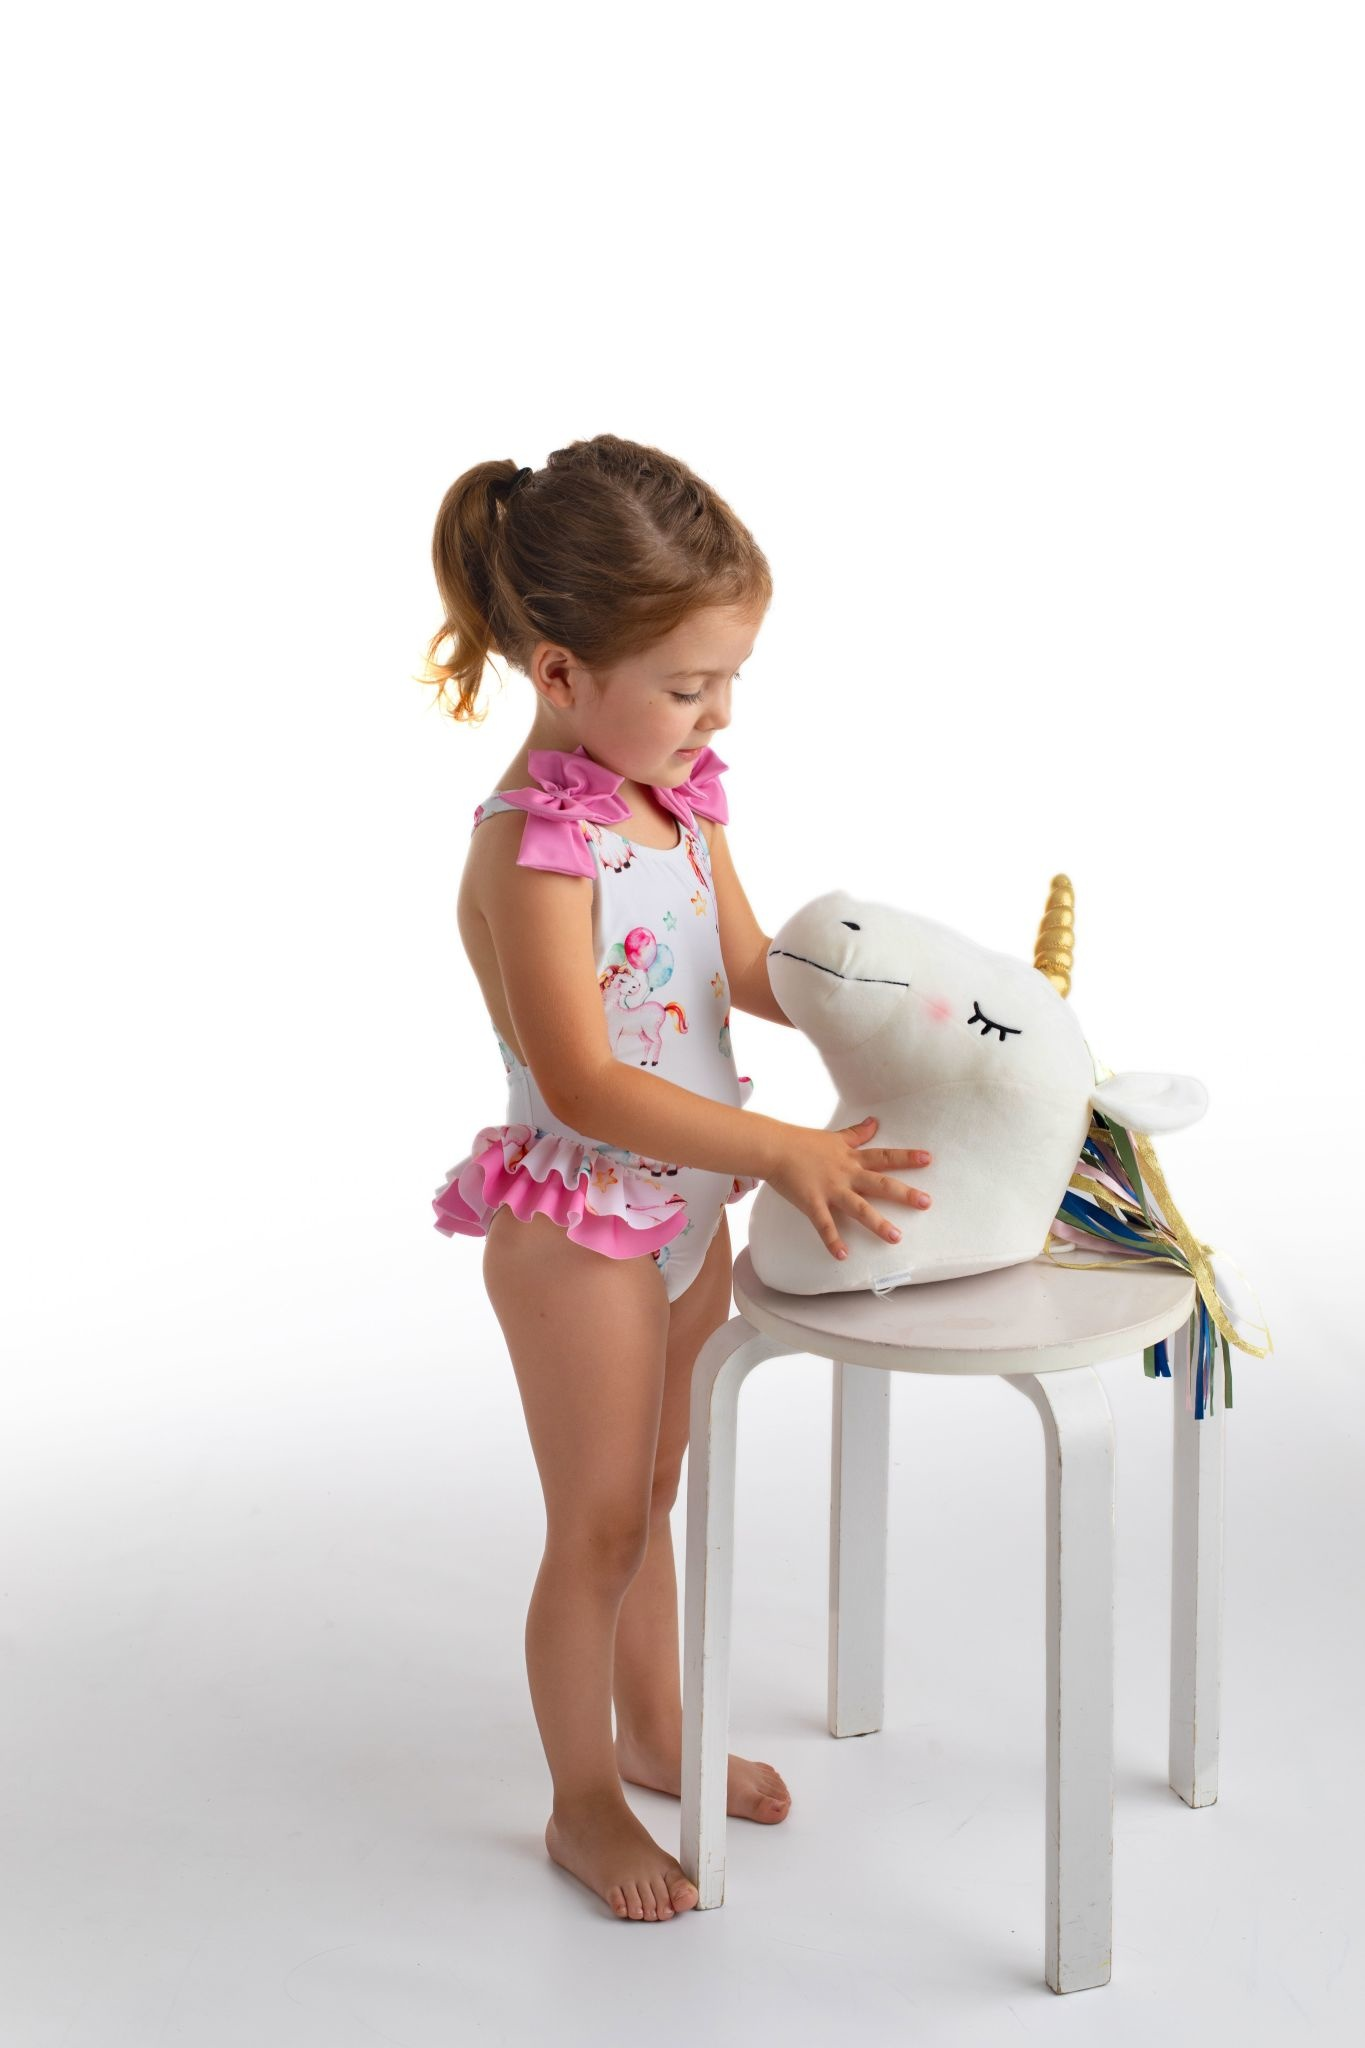 Meia Pata MEIA PATA - Unicorn Swimsuit S21